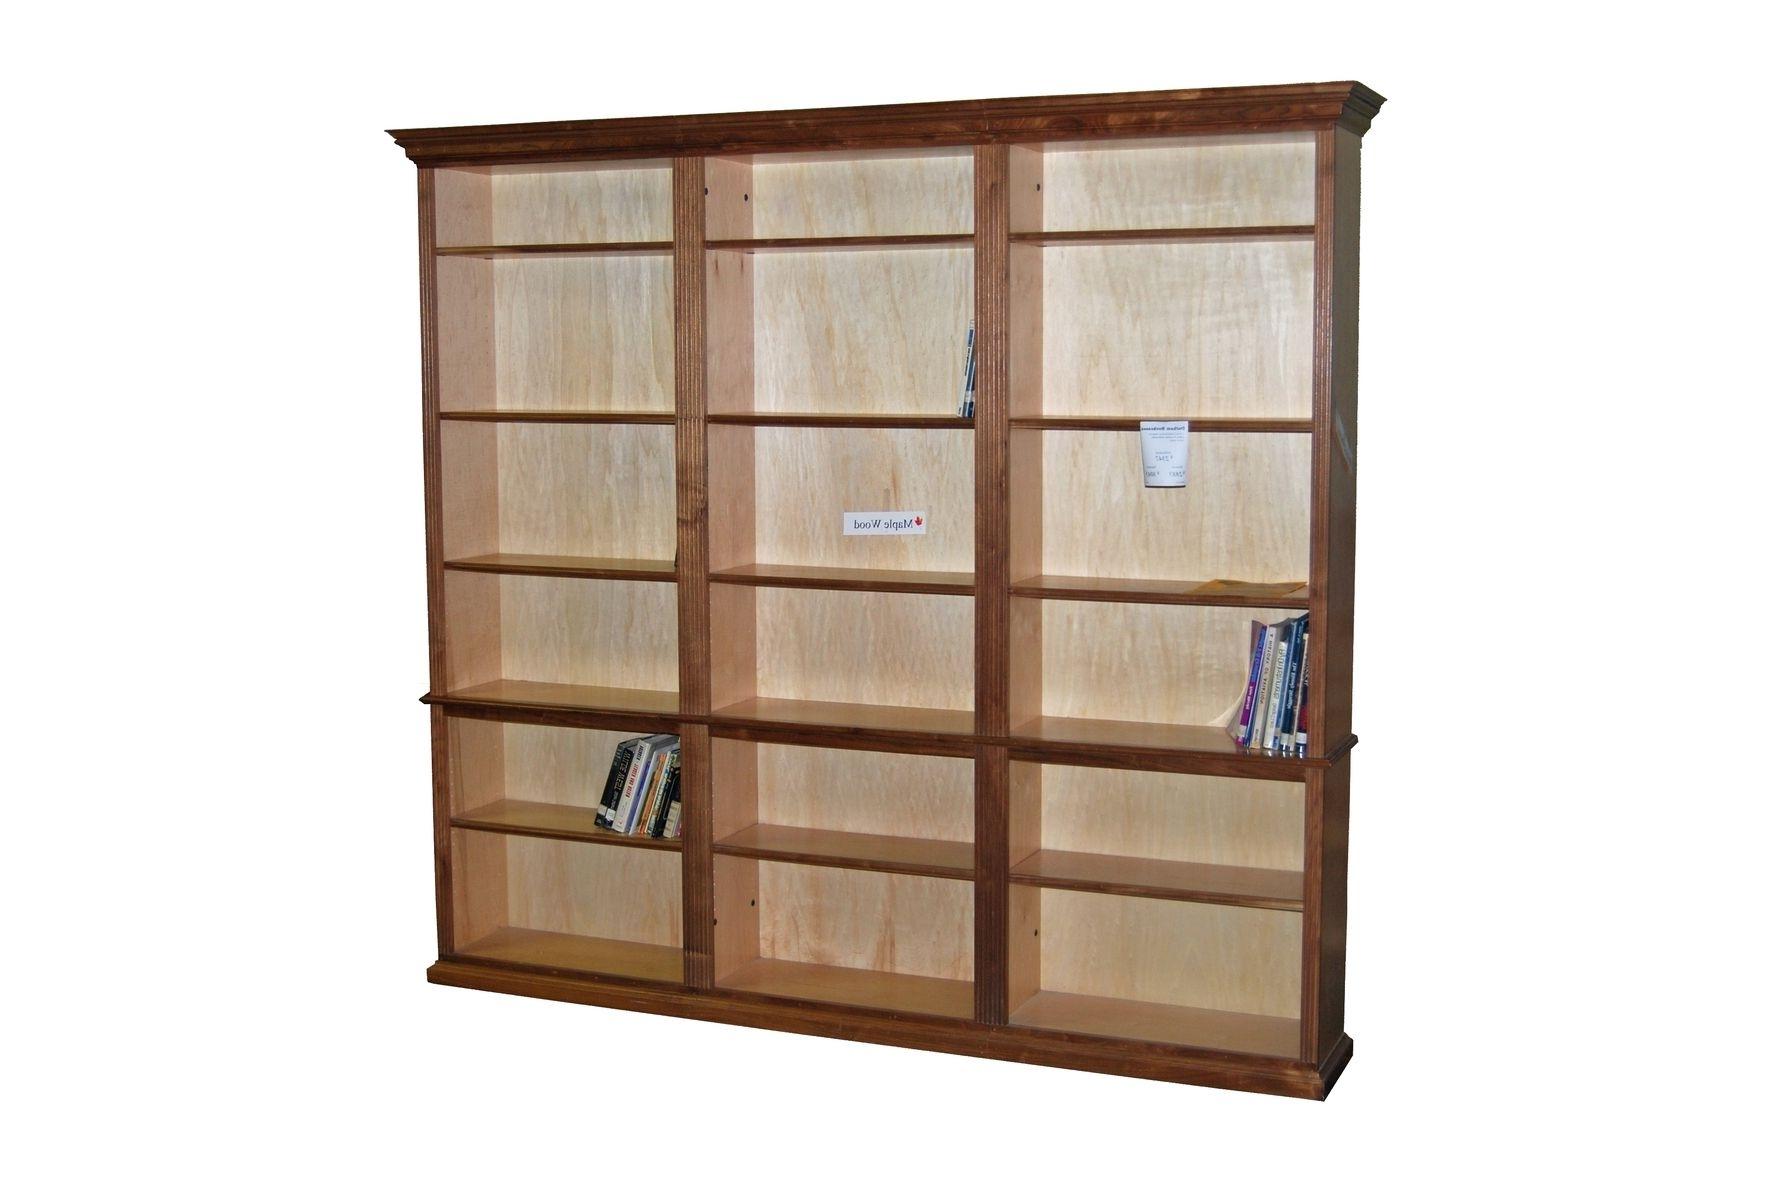 Fashionable Durham Bookcases Inside Phillip Fletcher: Durham Bookcases (View 6 of 15)